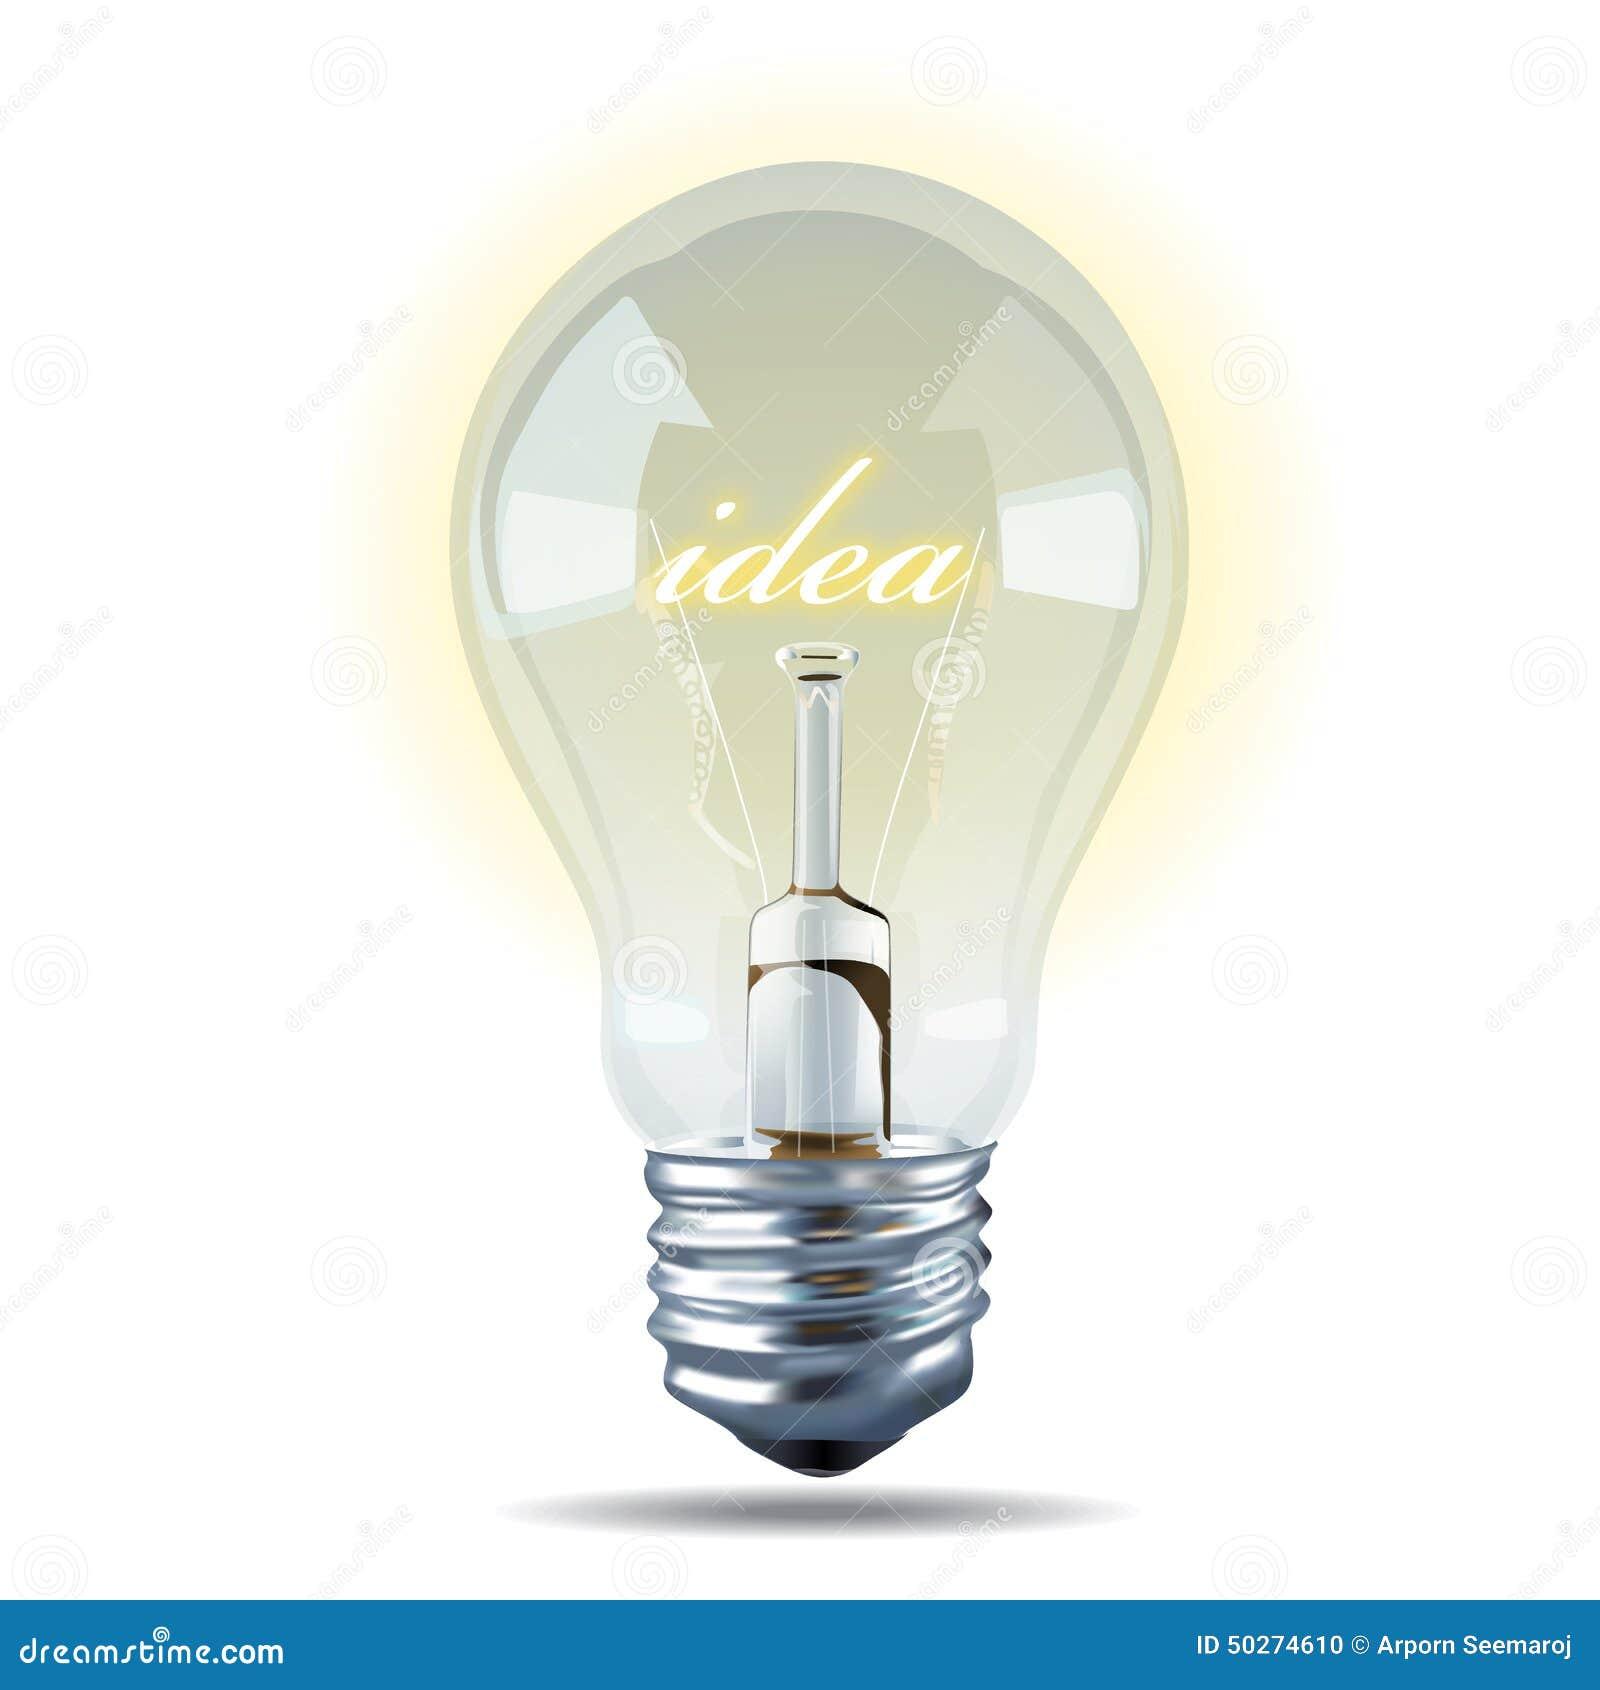 Defining Innovation and Creativity